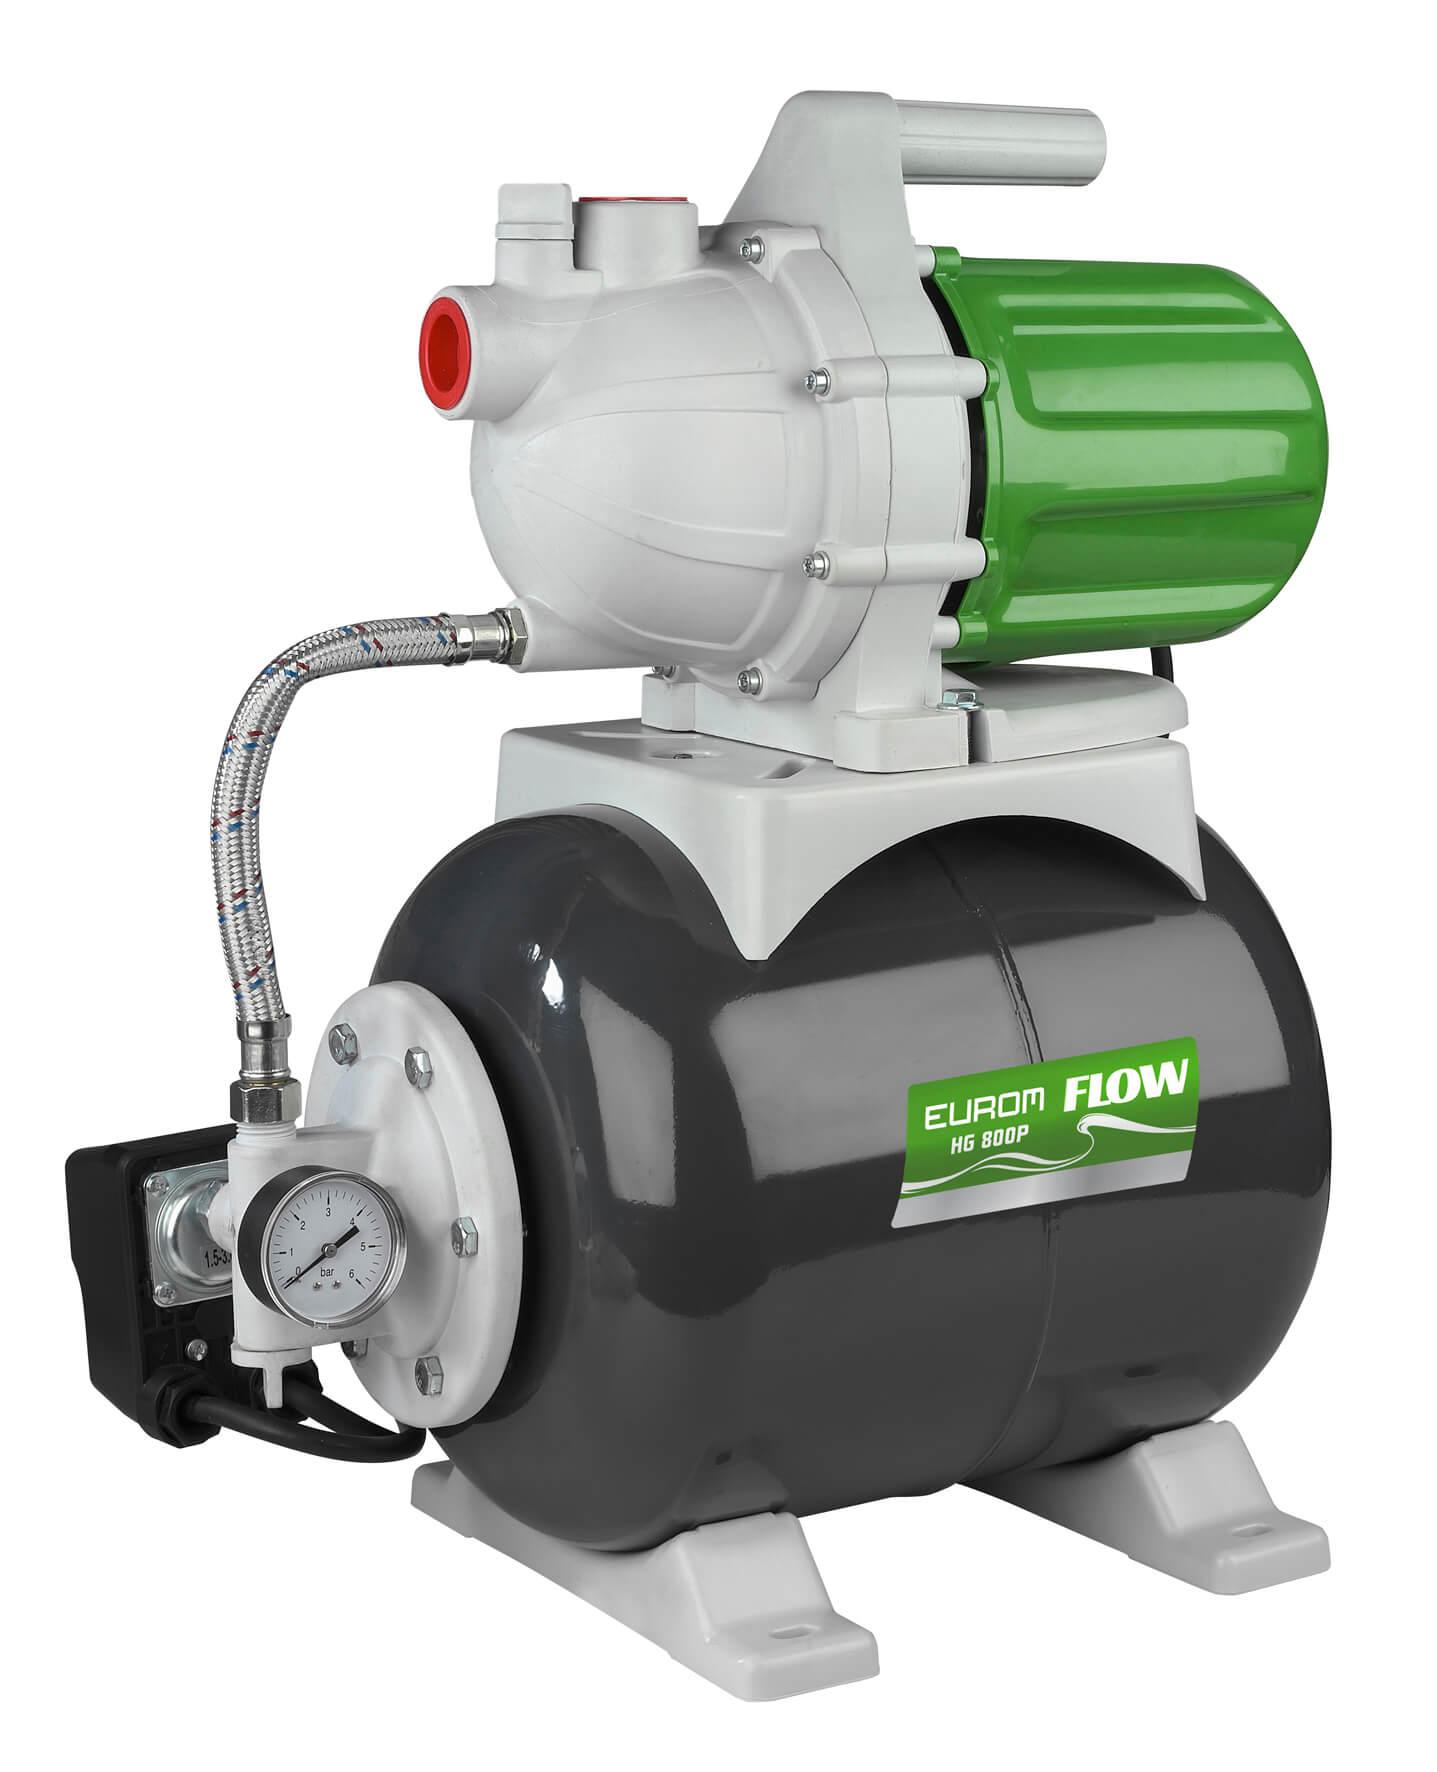 Eurom Flow HG 800P Drukpomp 800W | Hydrofoorgroep waterpomp